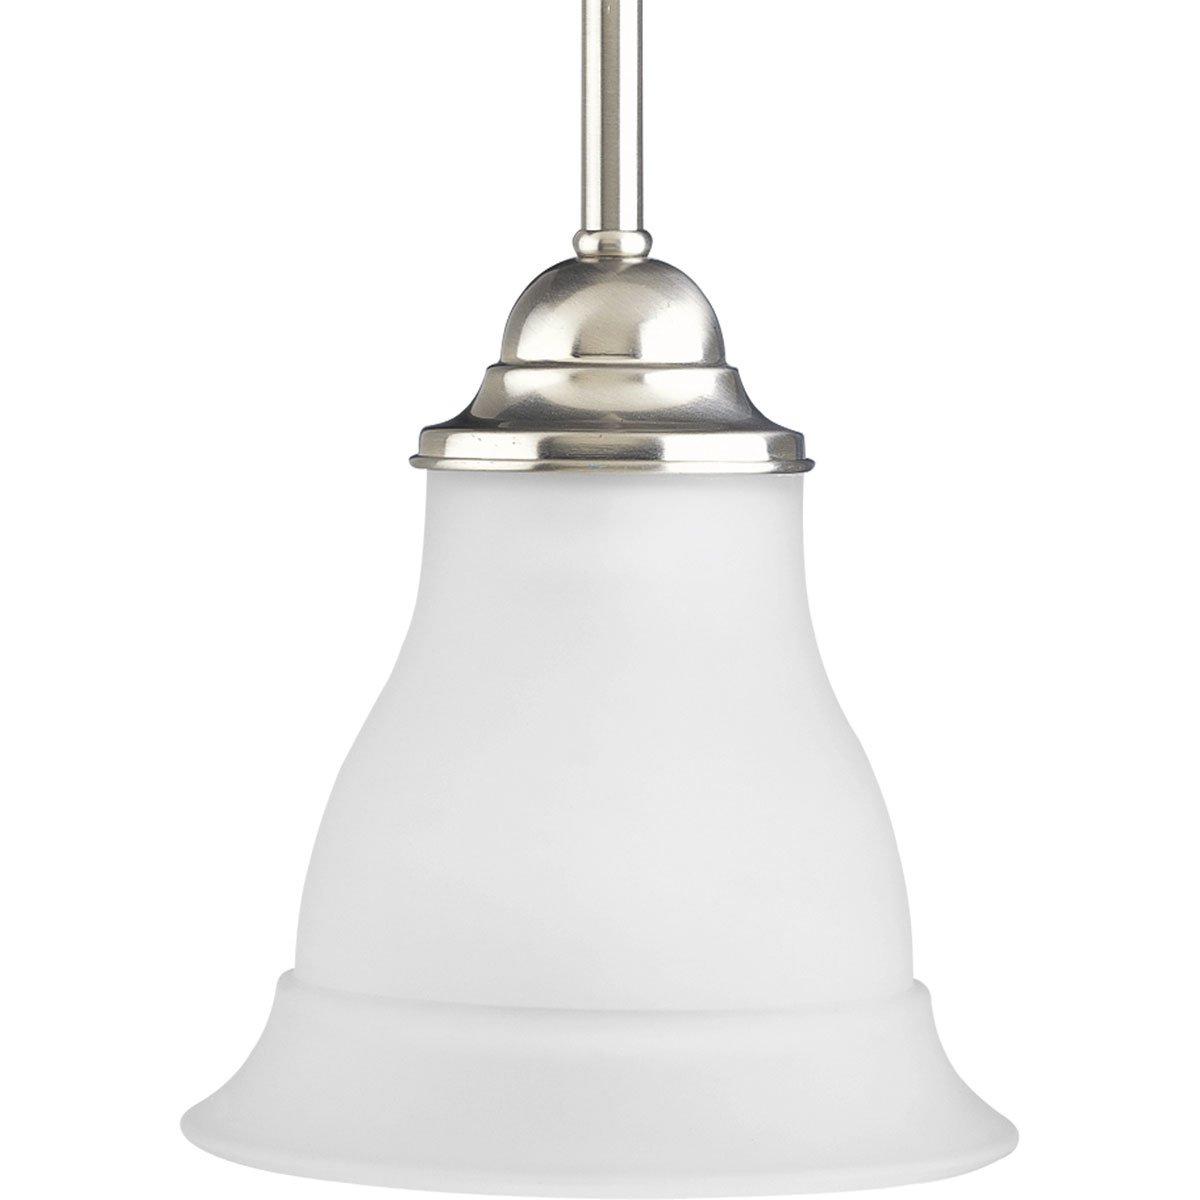 Progress Lighting P5096 09 1 Light Mini Pendant Brushed Nickel